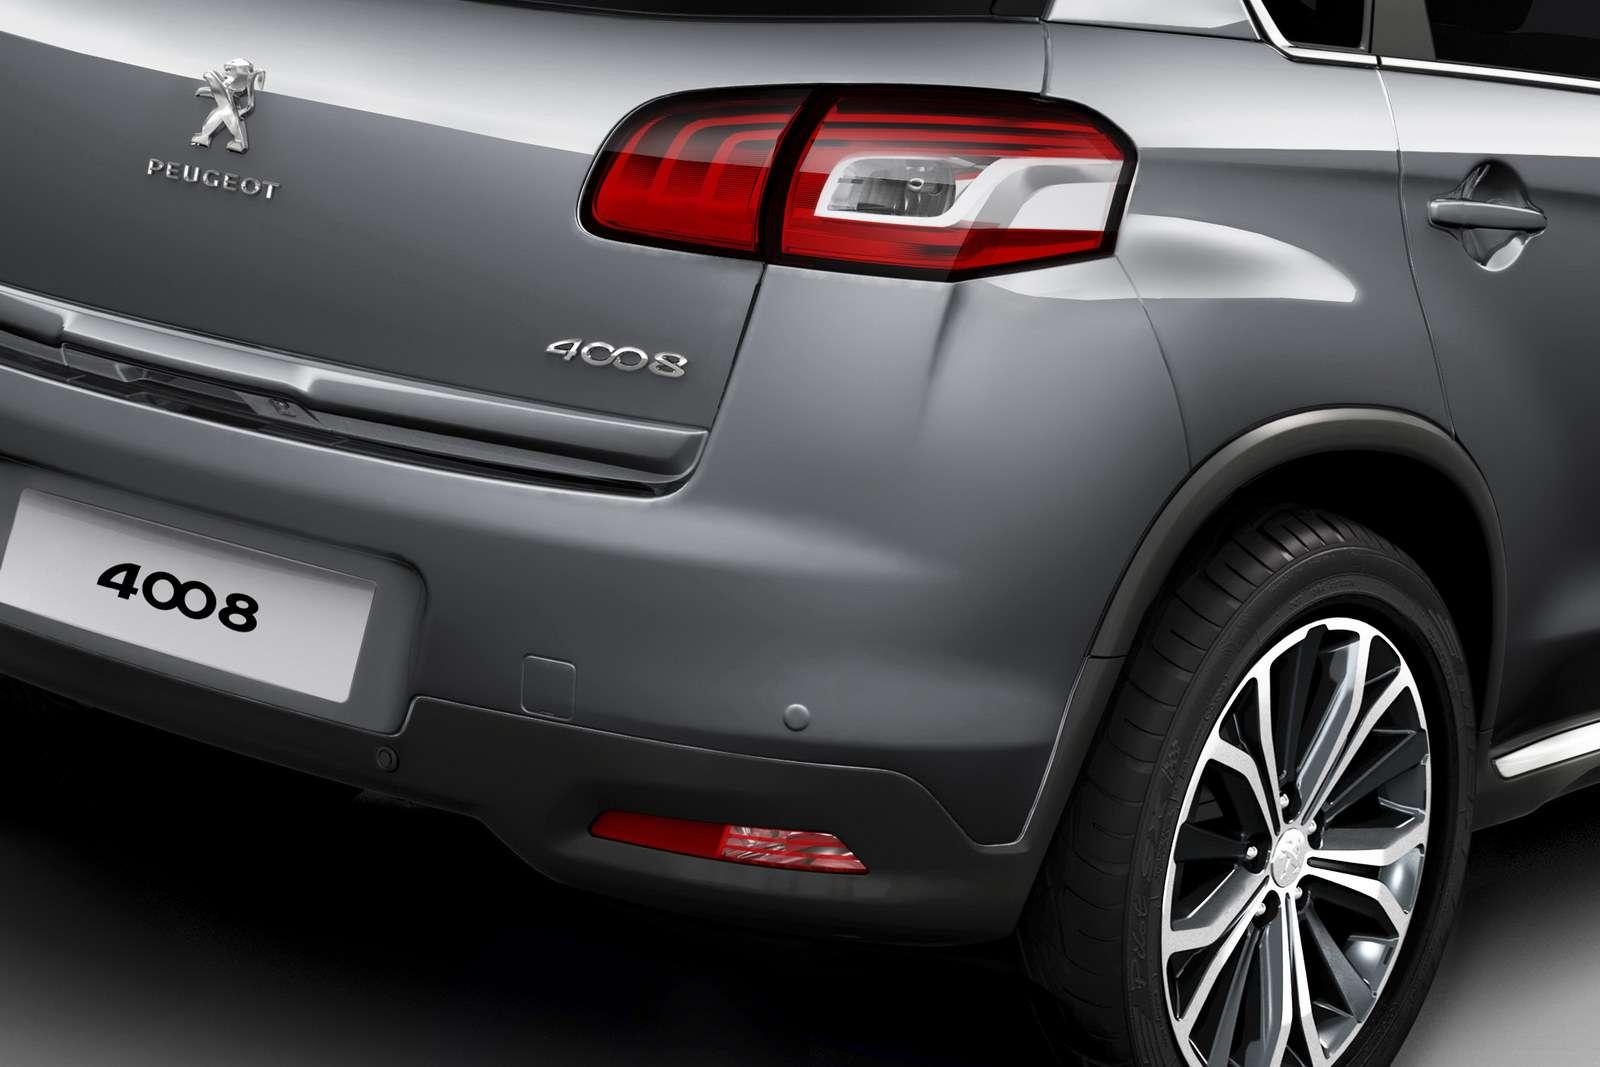 Peugeot 4008 new car pazdziernik 2011